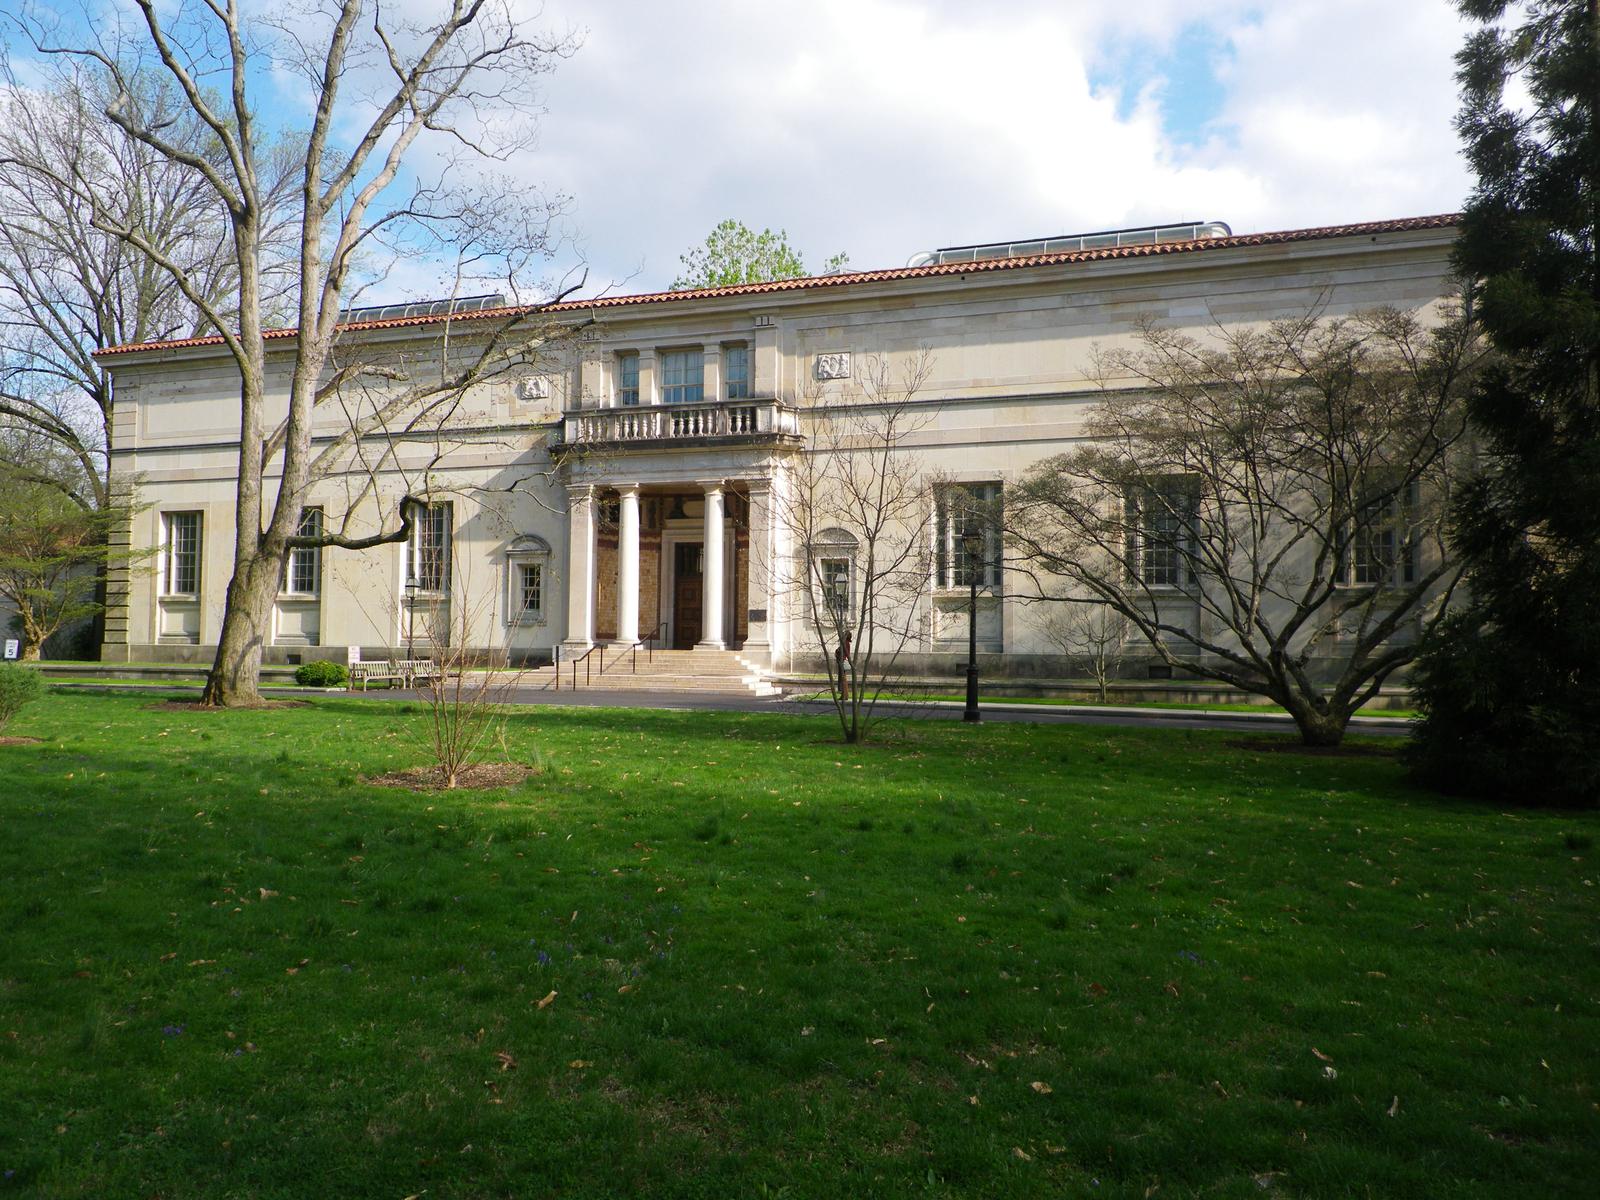 Barnes Foundation on the Philadelphia Parkway   Geno's ...